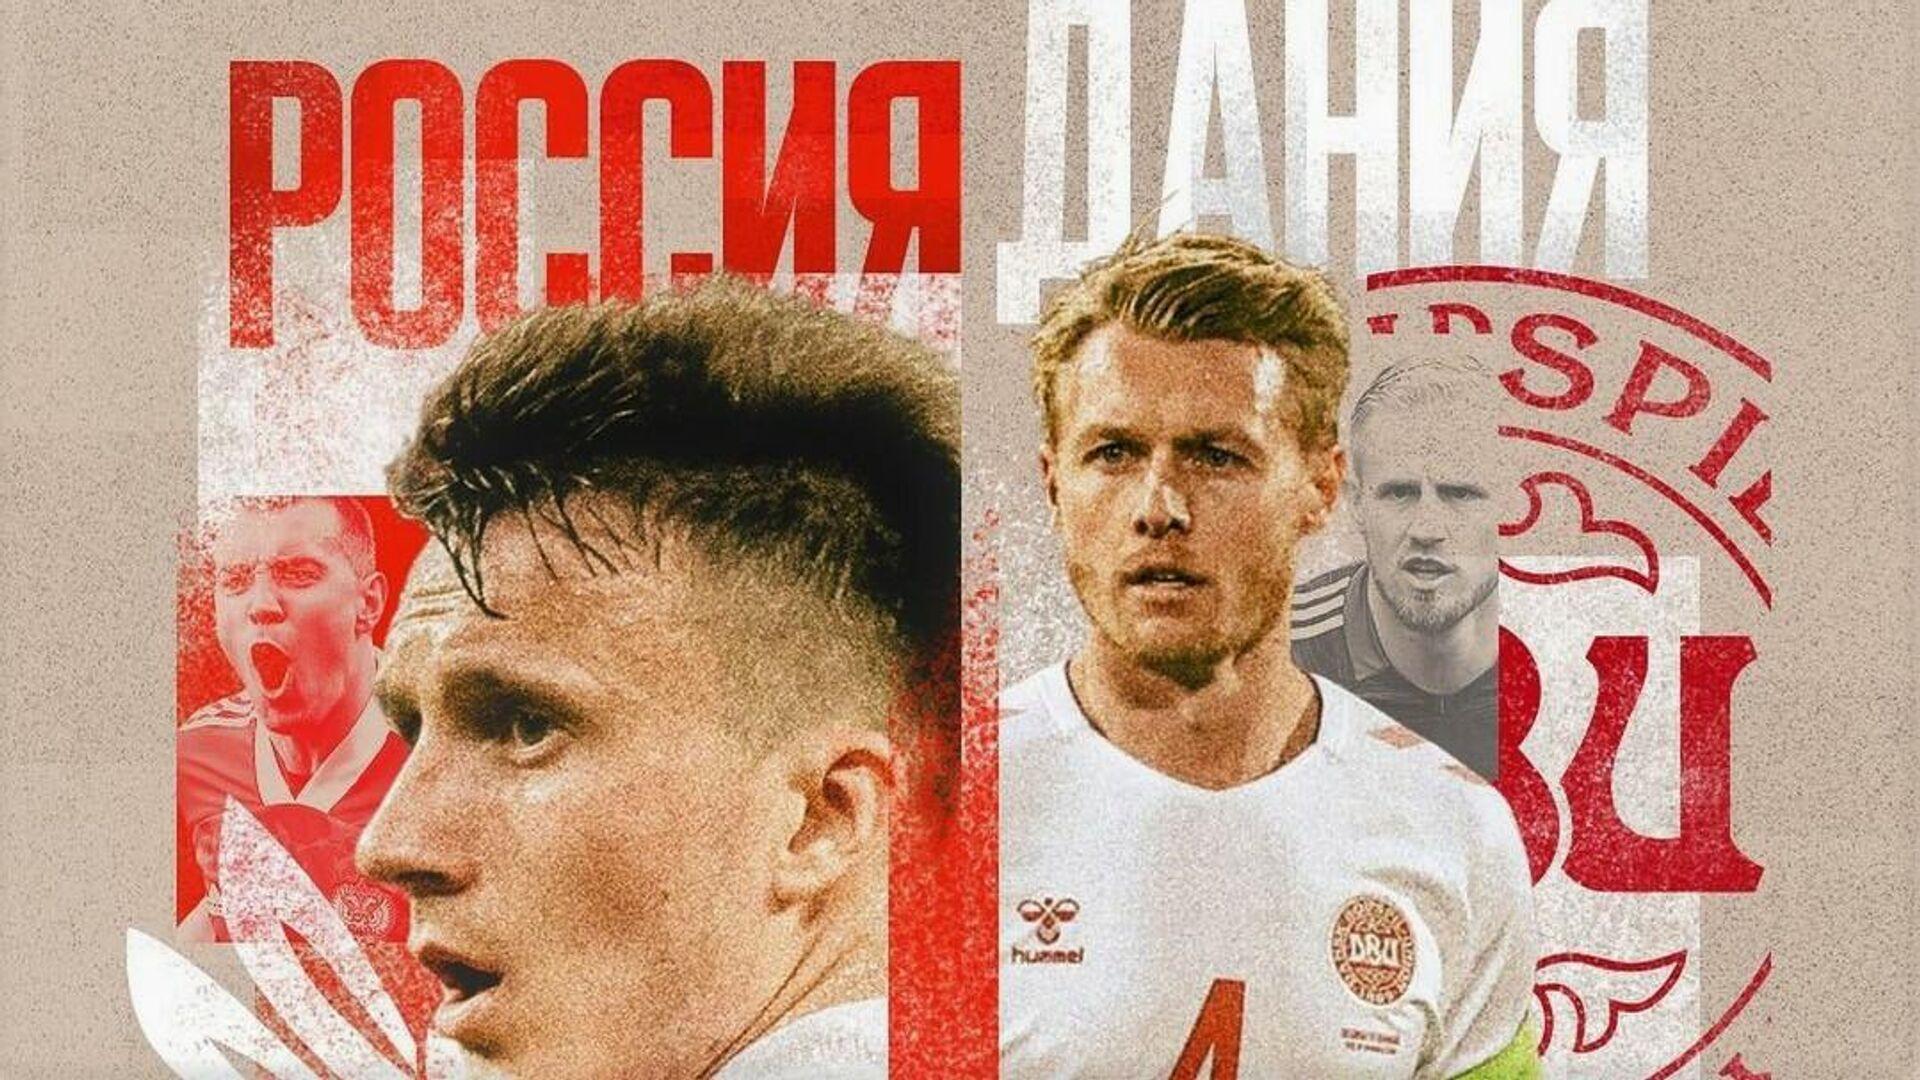 Россия против Дании на ЕВРО-2020 - РИА Новости, 1920, 21.06.2021